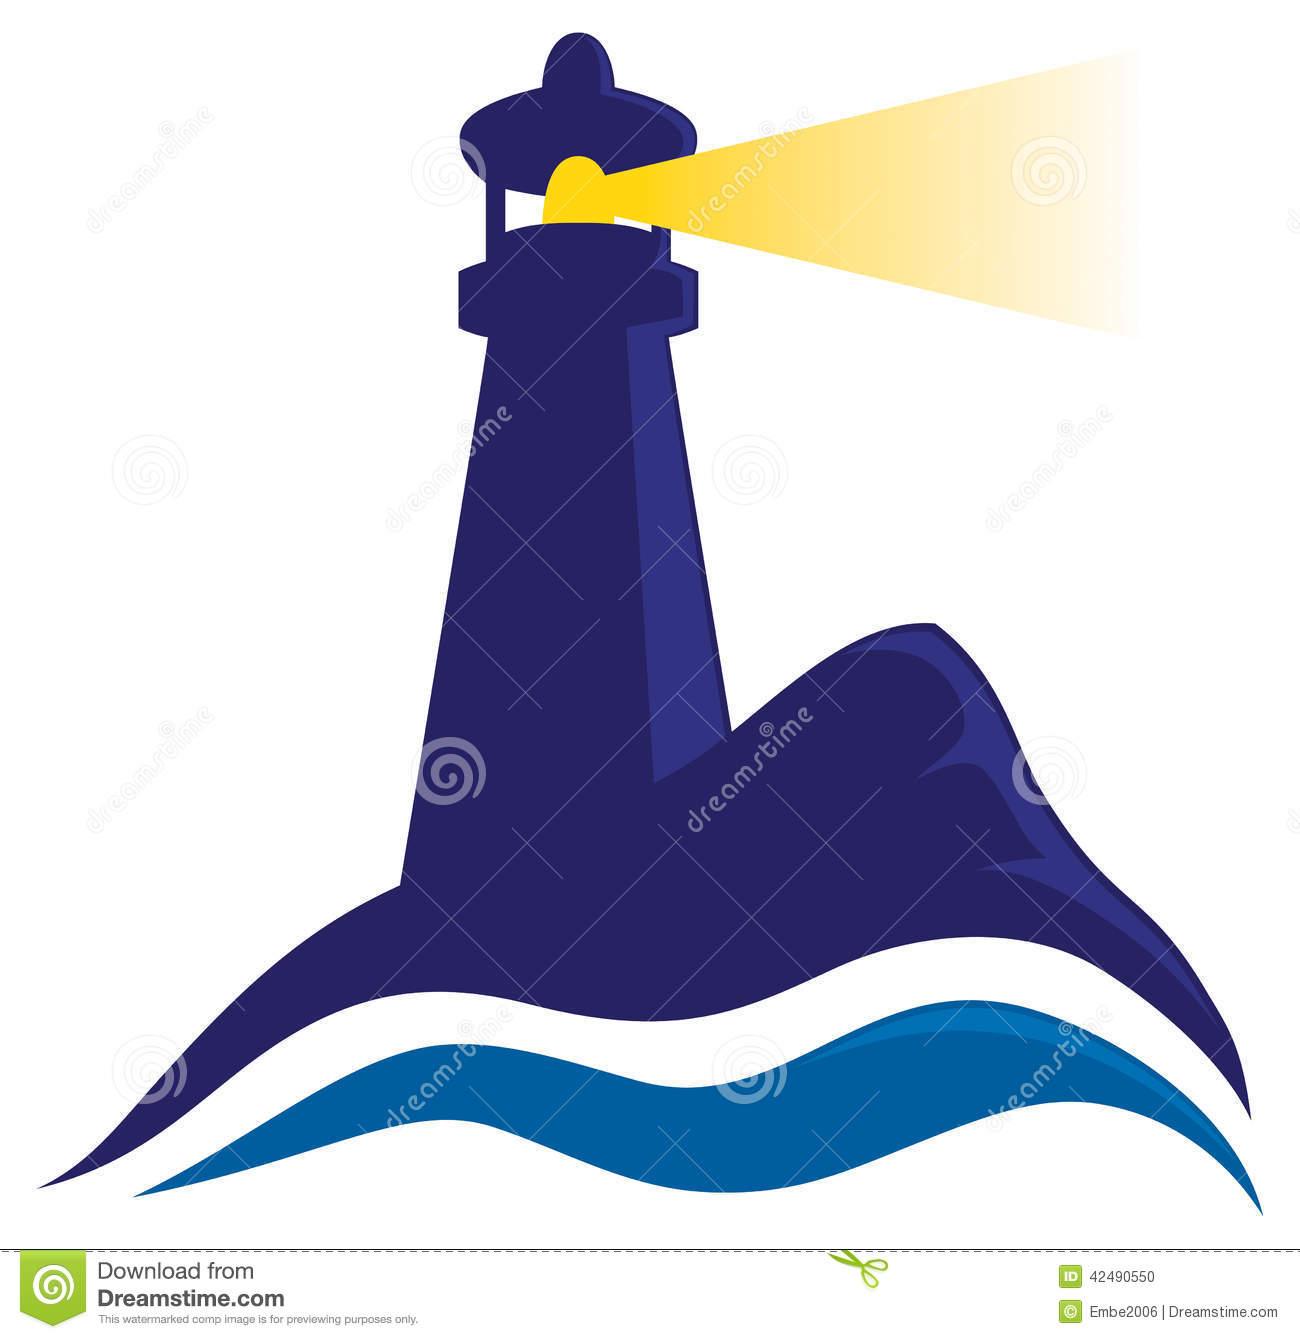 Lighhouse clipart purple Lighthouse lighthouse clipart its lighthouse